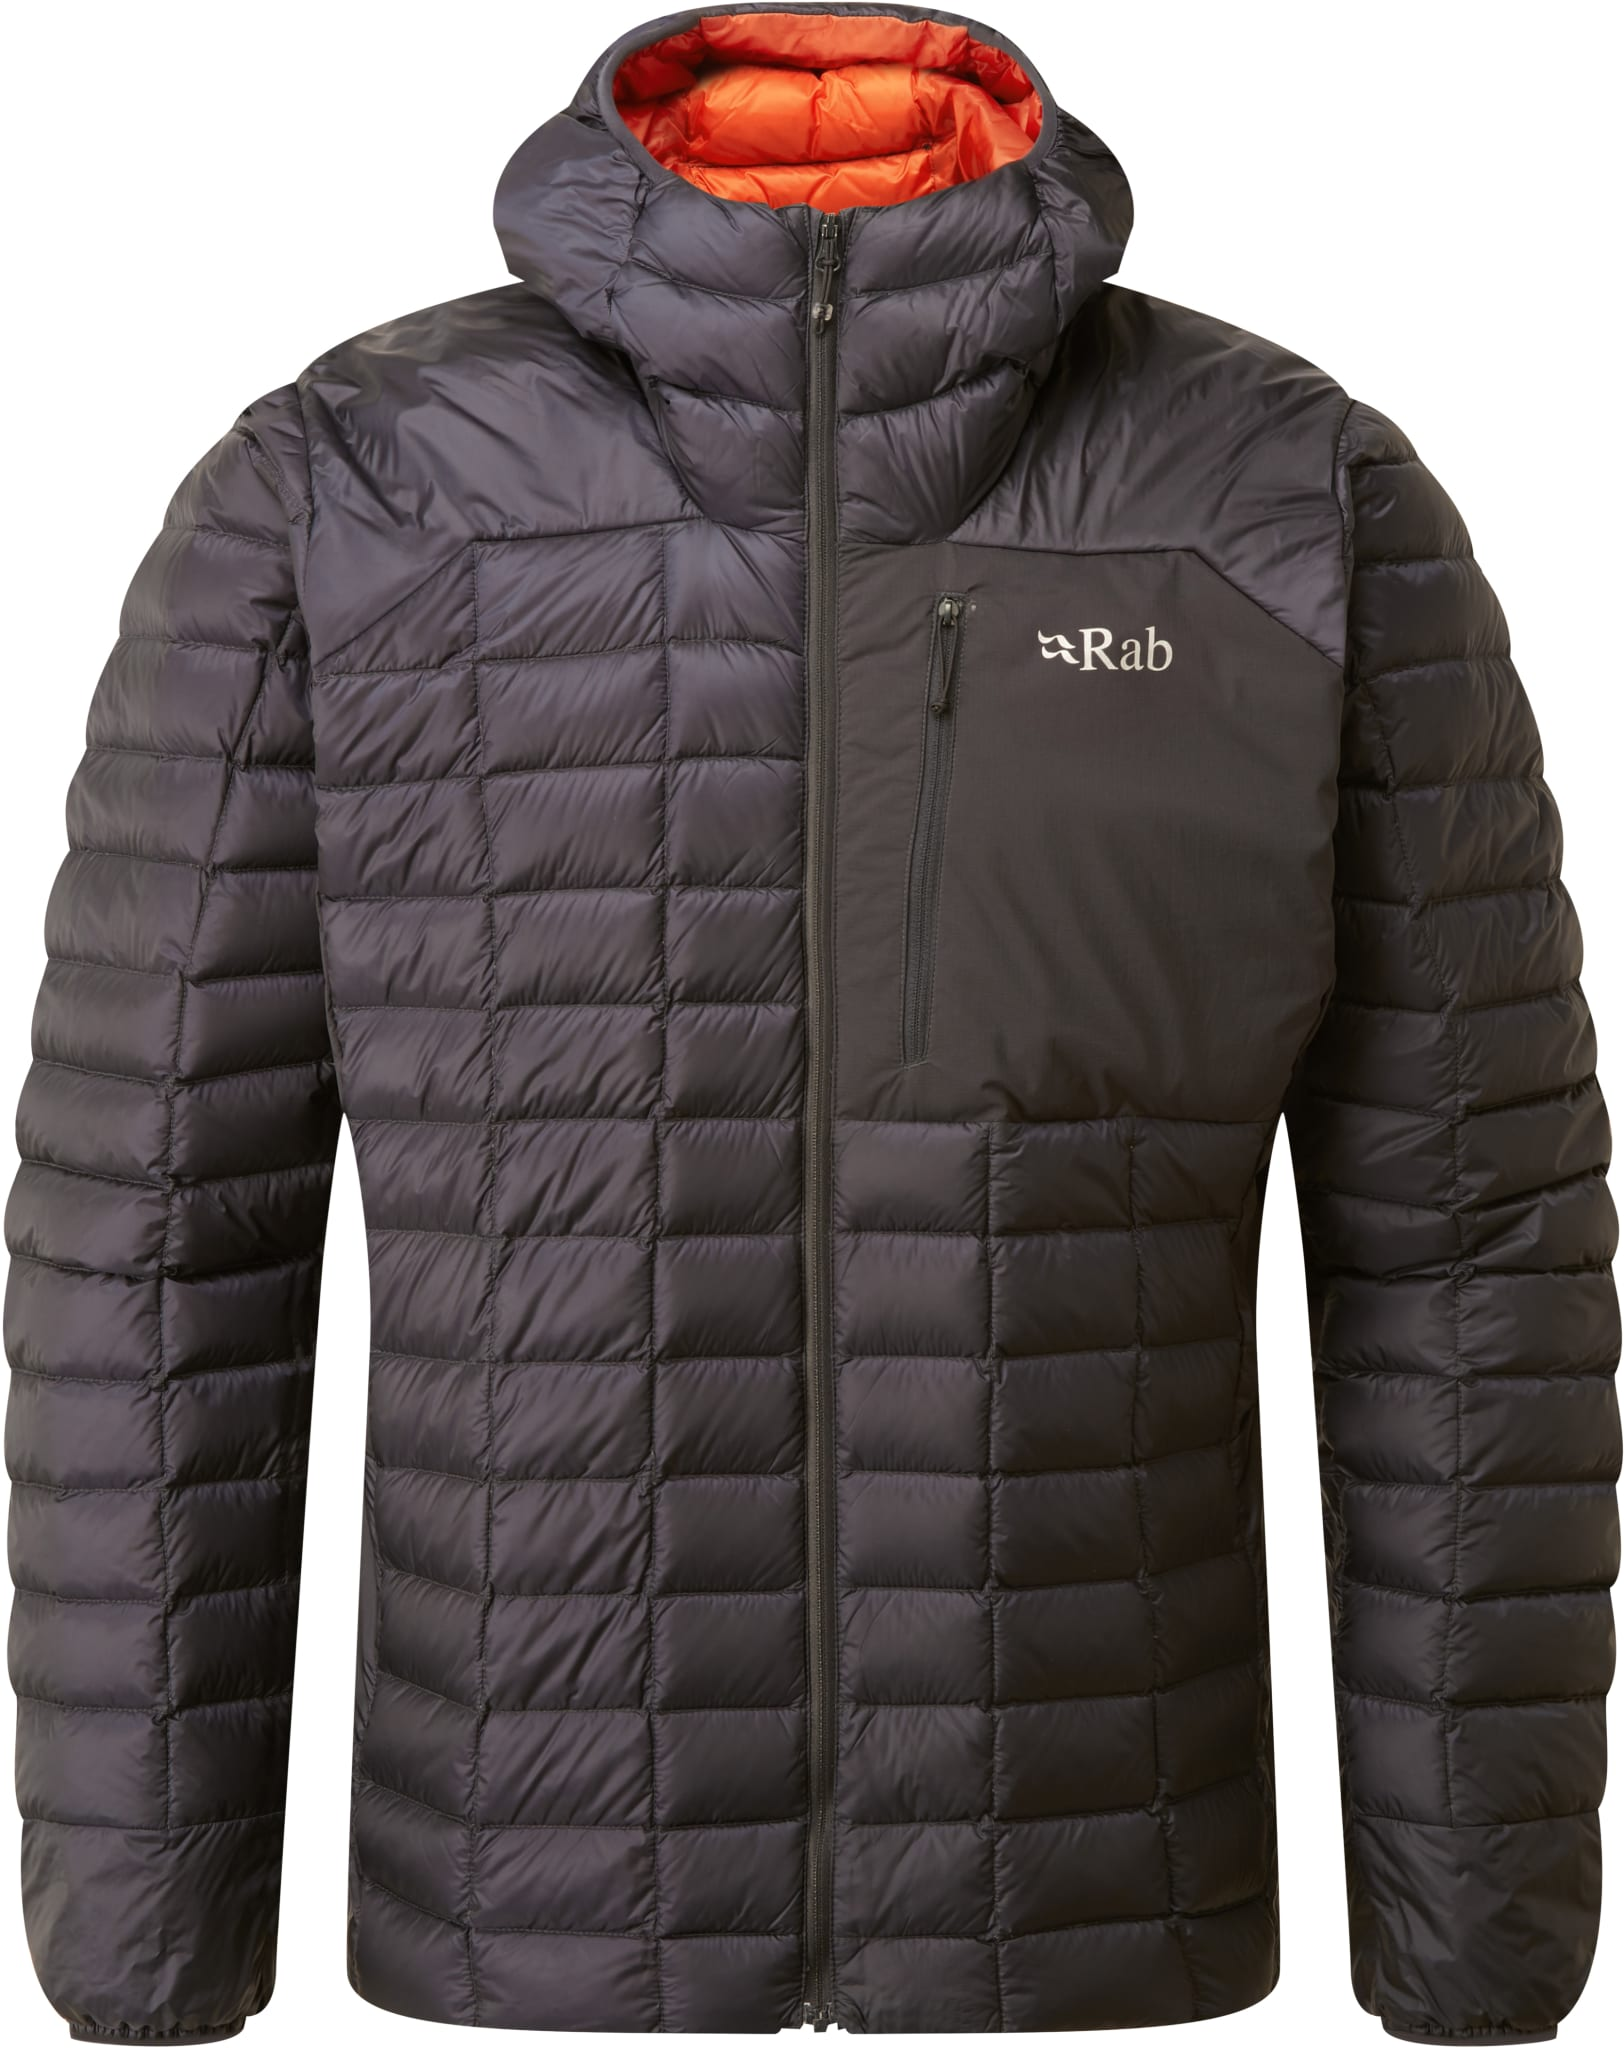 Kaon Jacket Ms